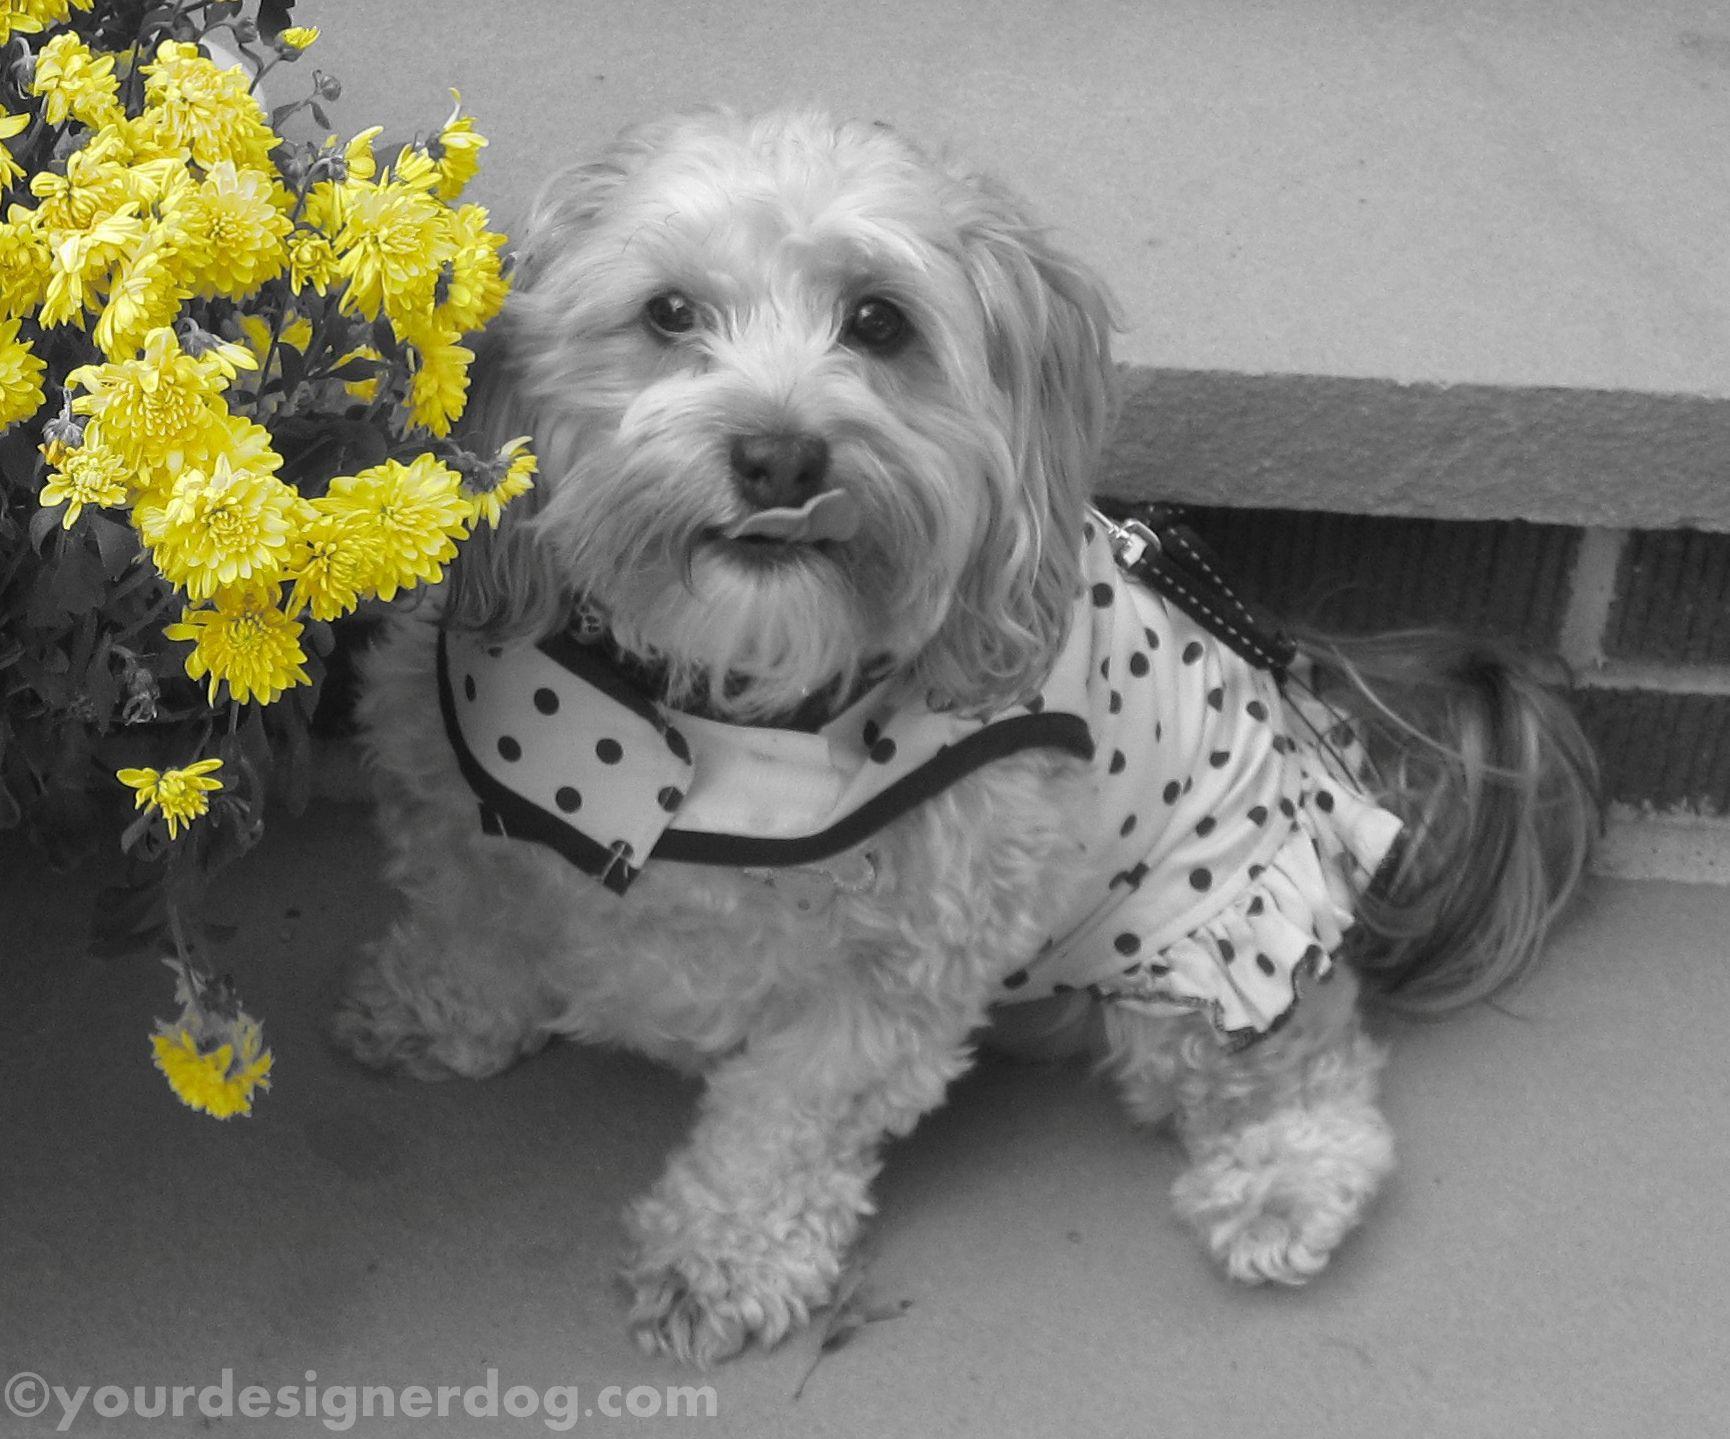 Yourdesignerdog blog features the adorable photos and amusing antics